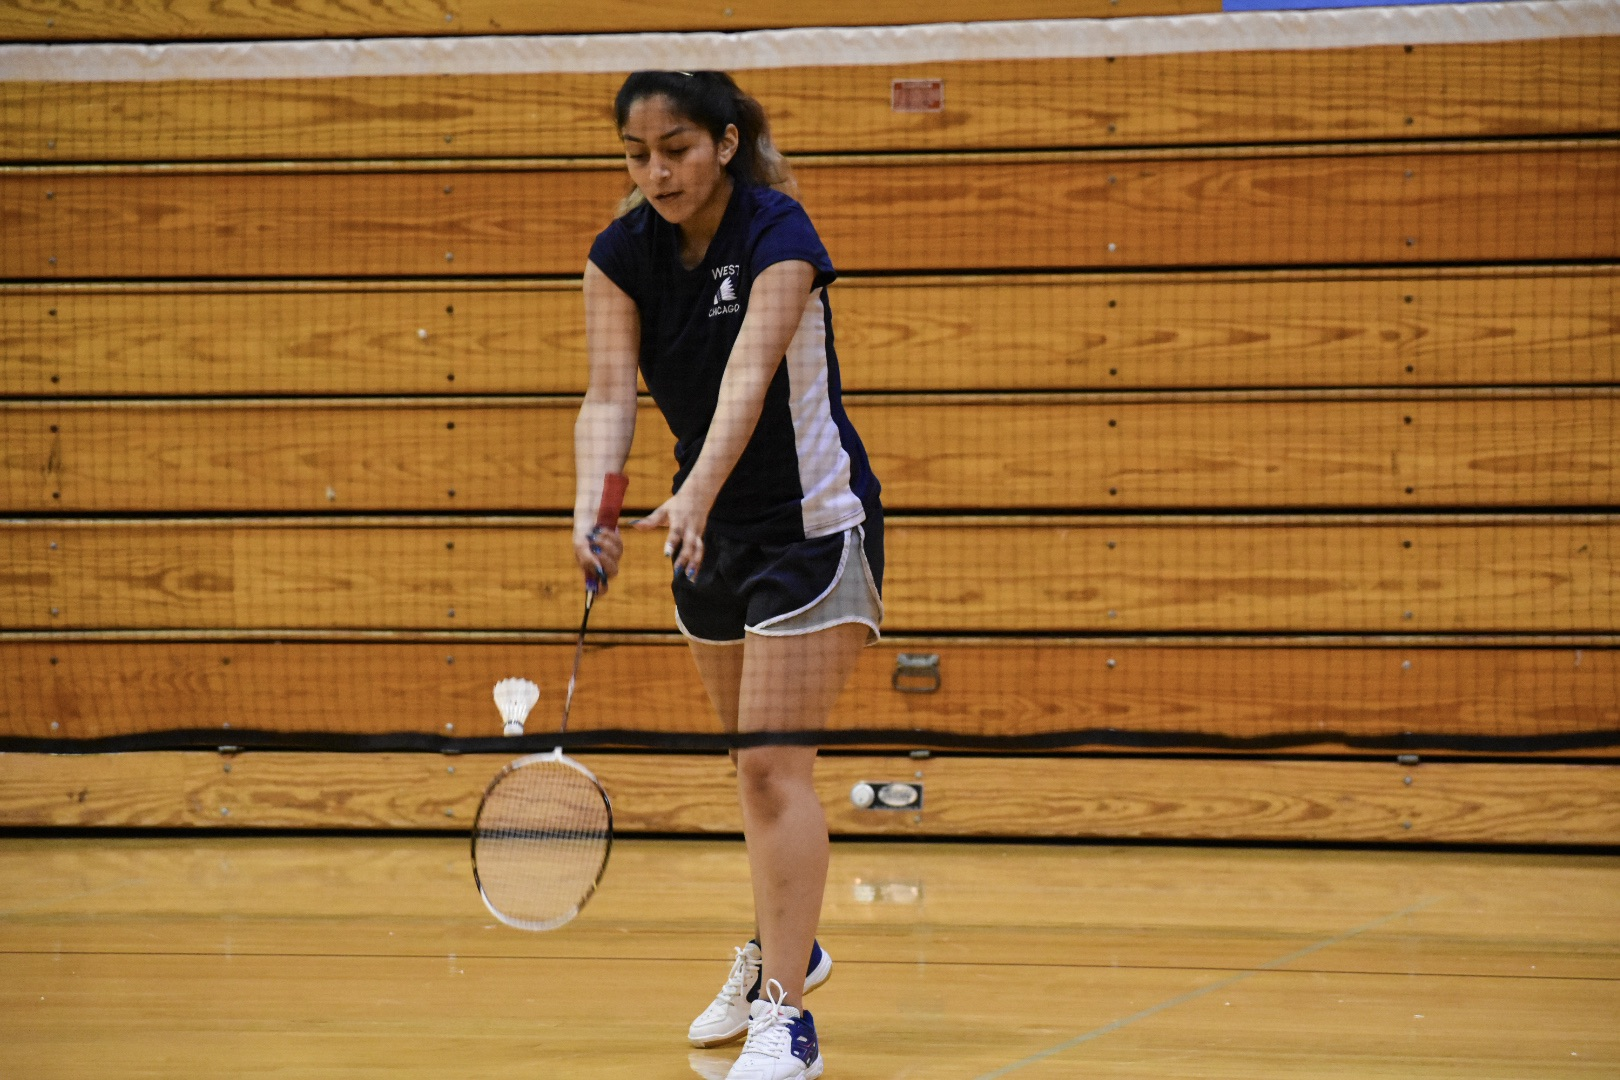 Senior captain Leslie Bueno serving in her singles match.